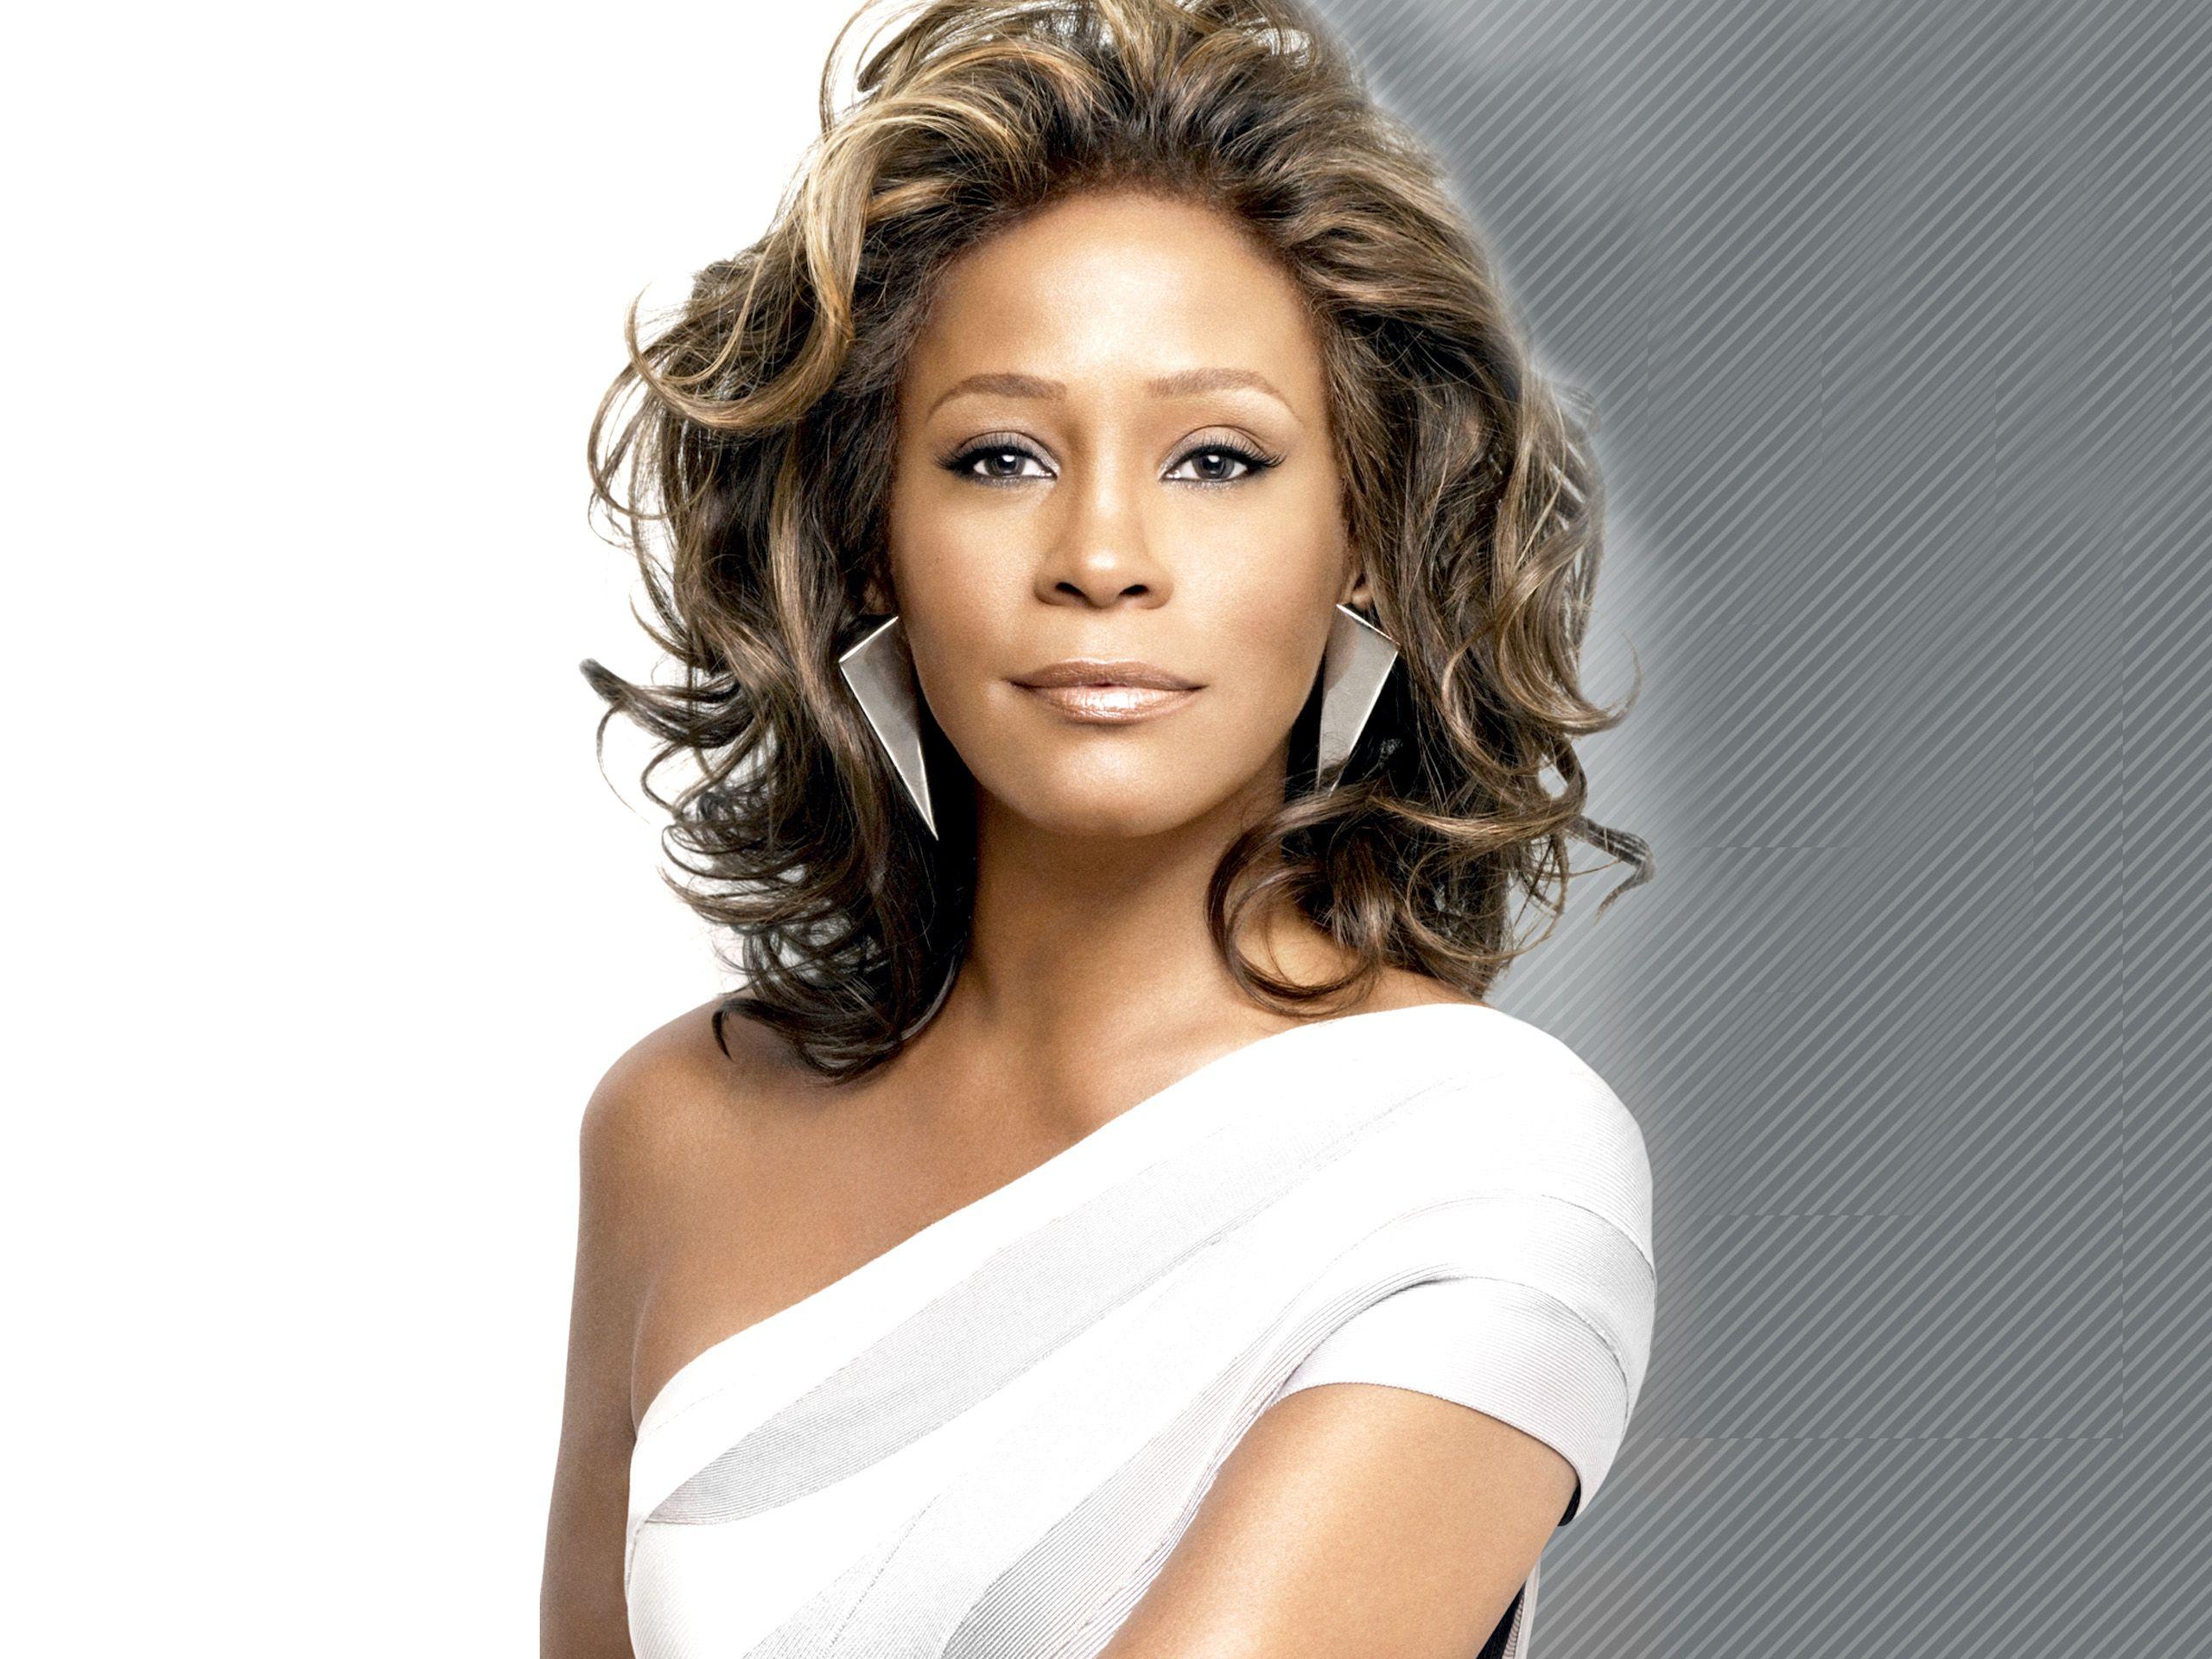 Whitney Houston - Bio, Family, Facts, Age: 48 | Hot Birthdays